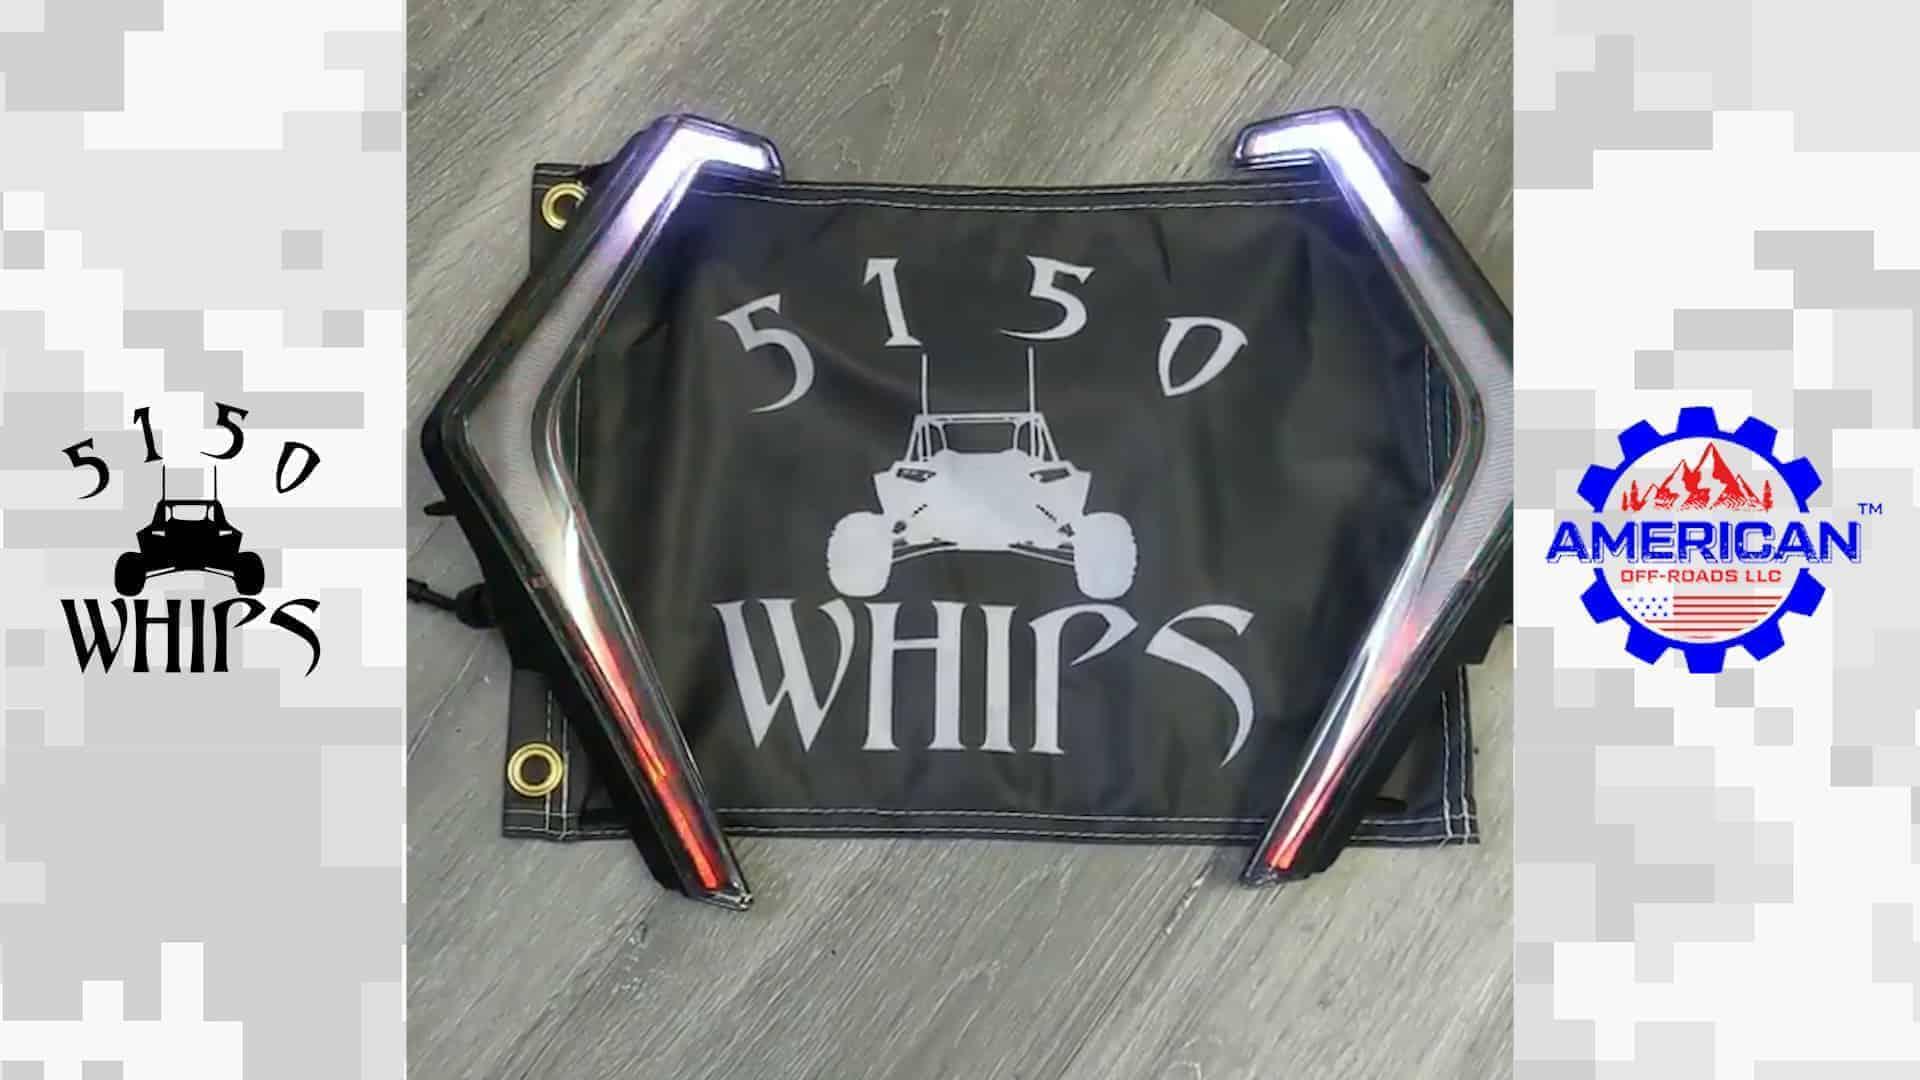 5150 Whips Polaris RZR Fang Lights